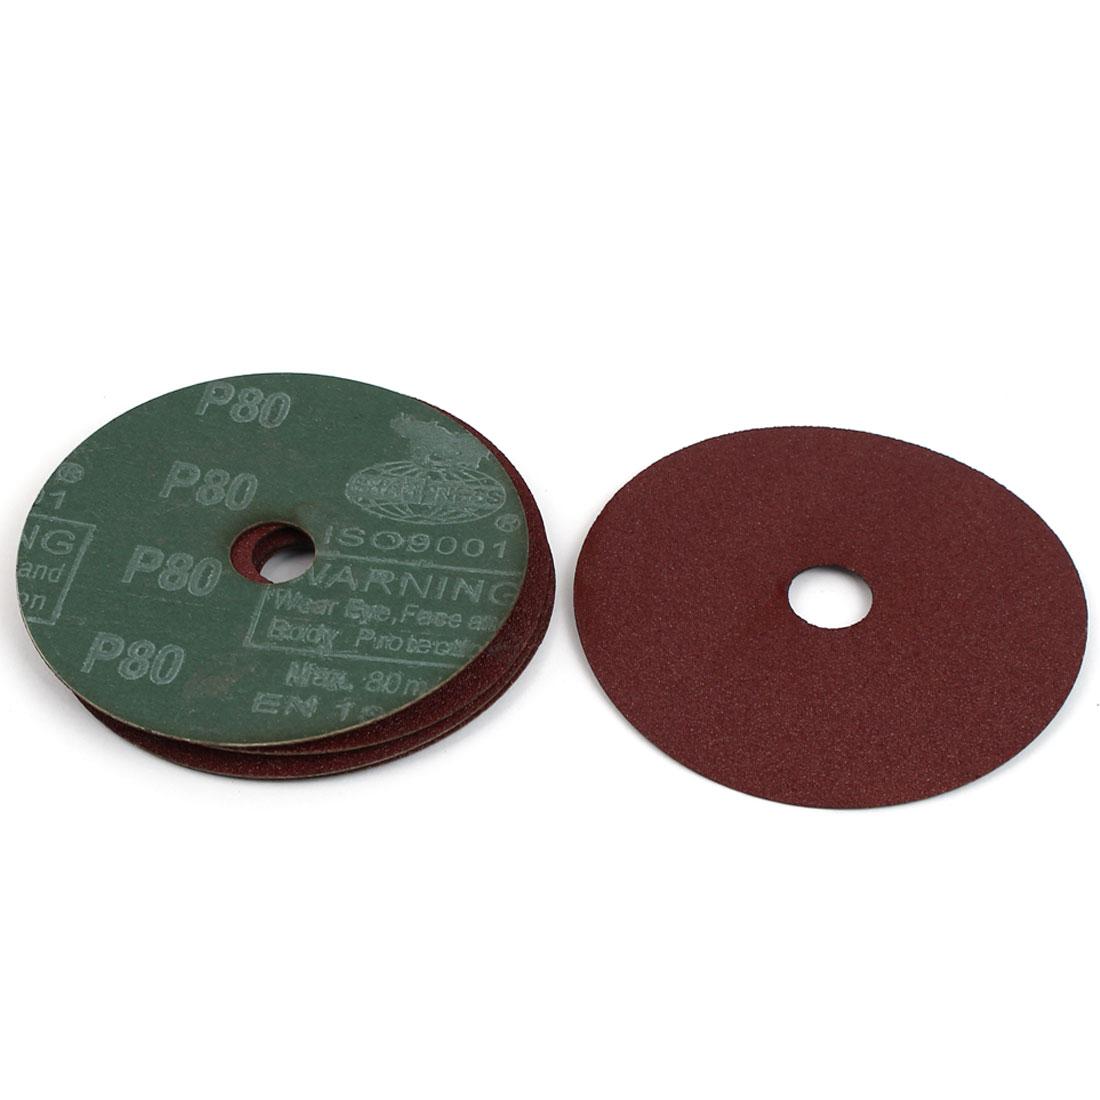 "Grinding Polishing Tool Sanding Disc Sandpaper 80 Grit 4"" Dia 5pcs"